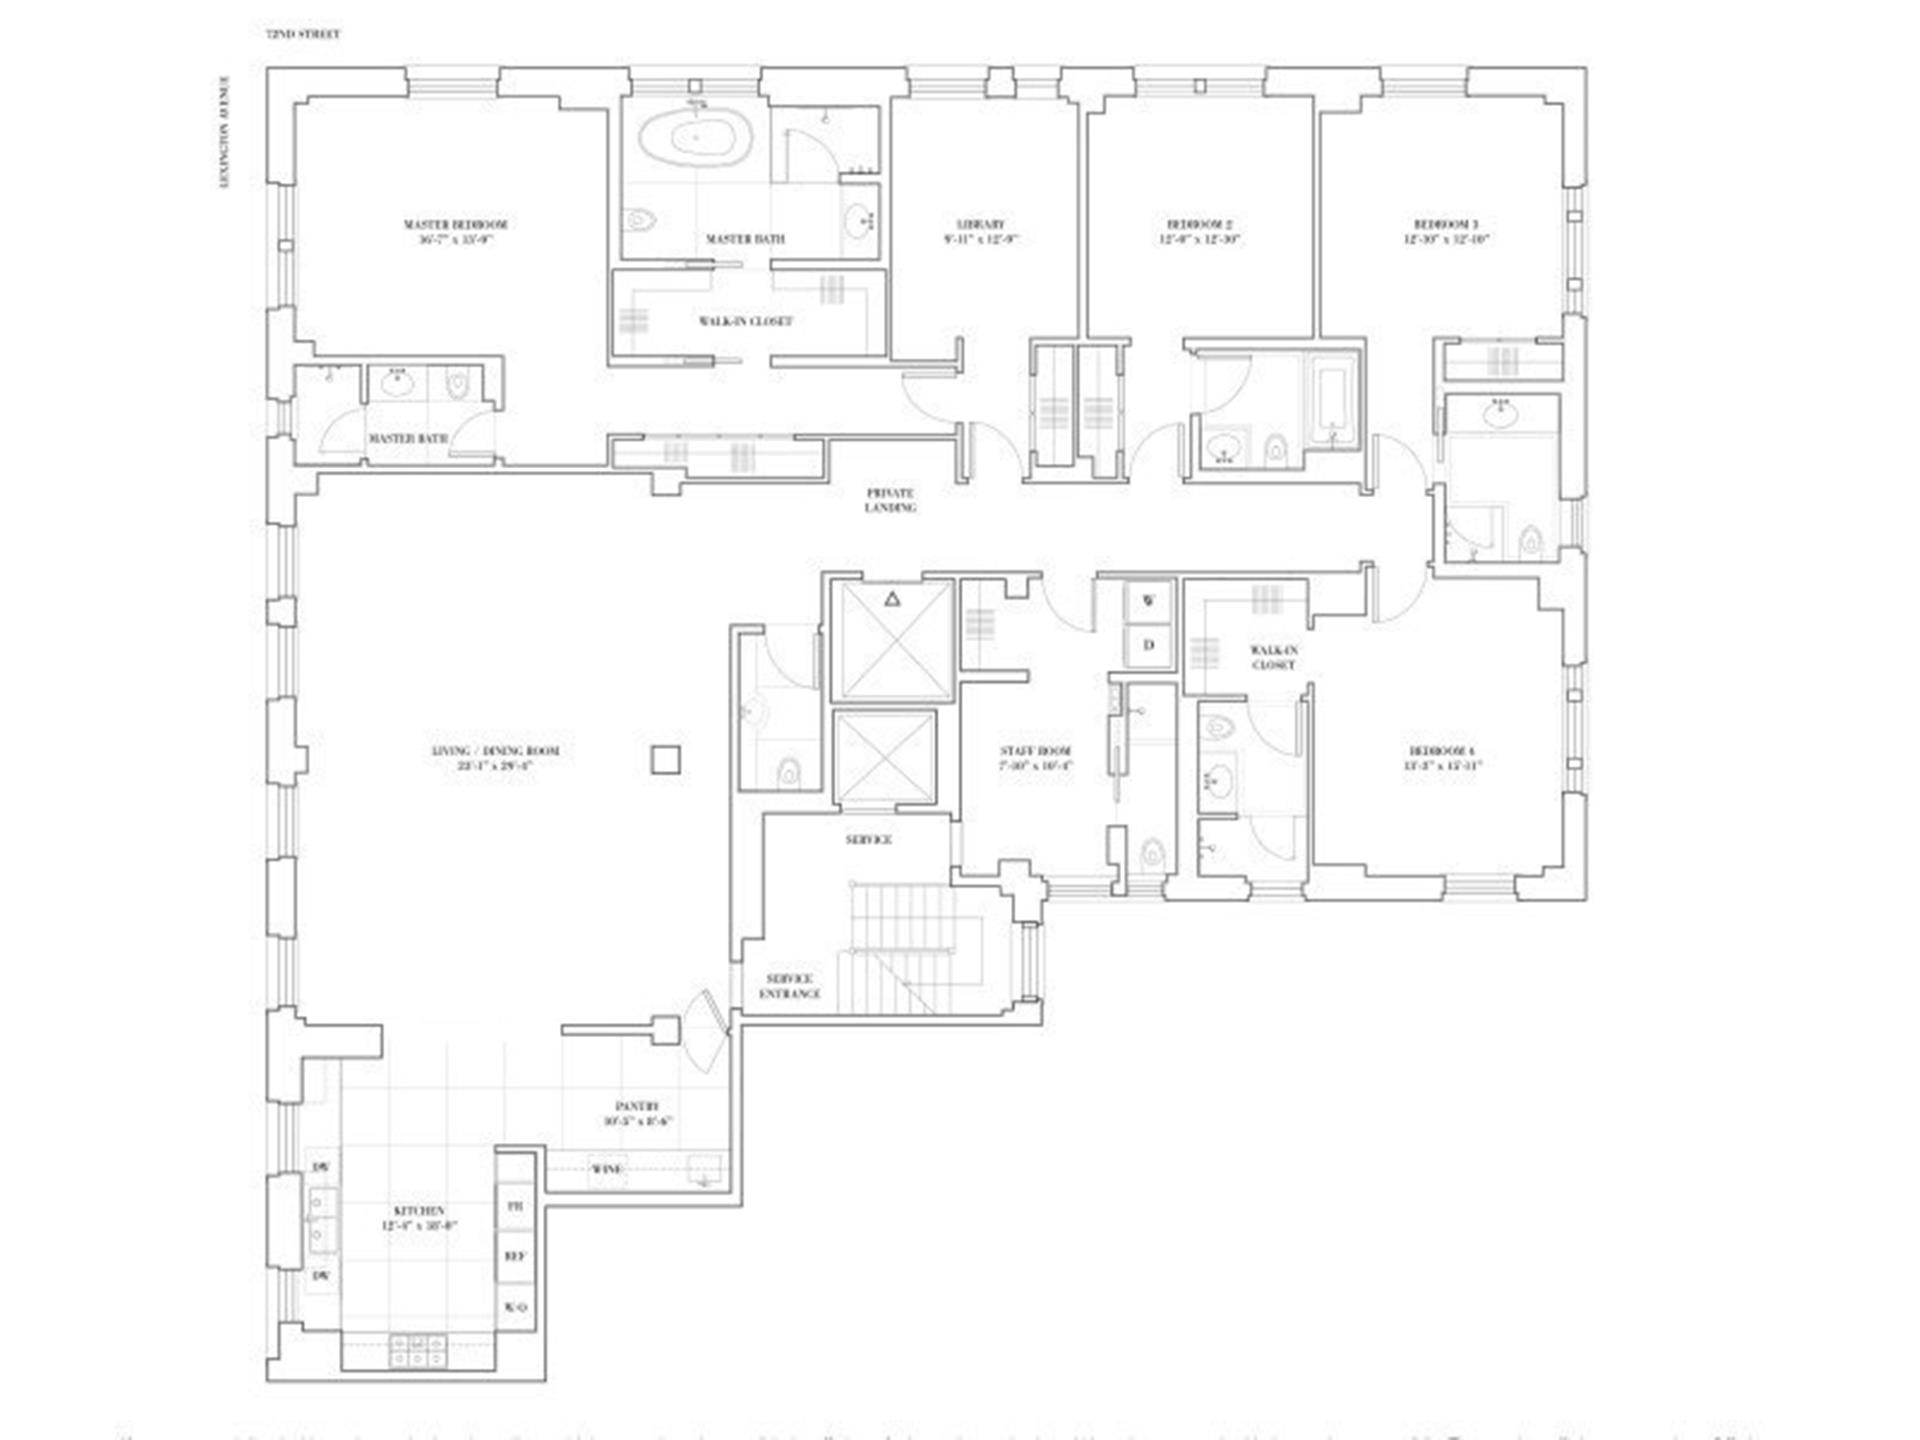 Floor plan of 150 East 72nd St, 4N - Upper East Side, New York